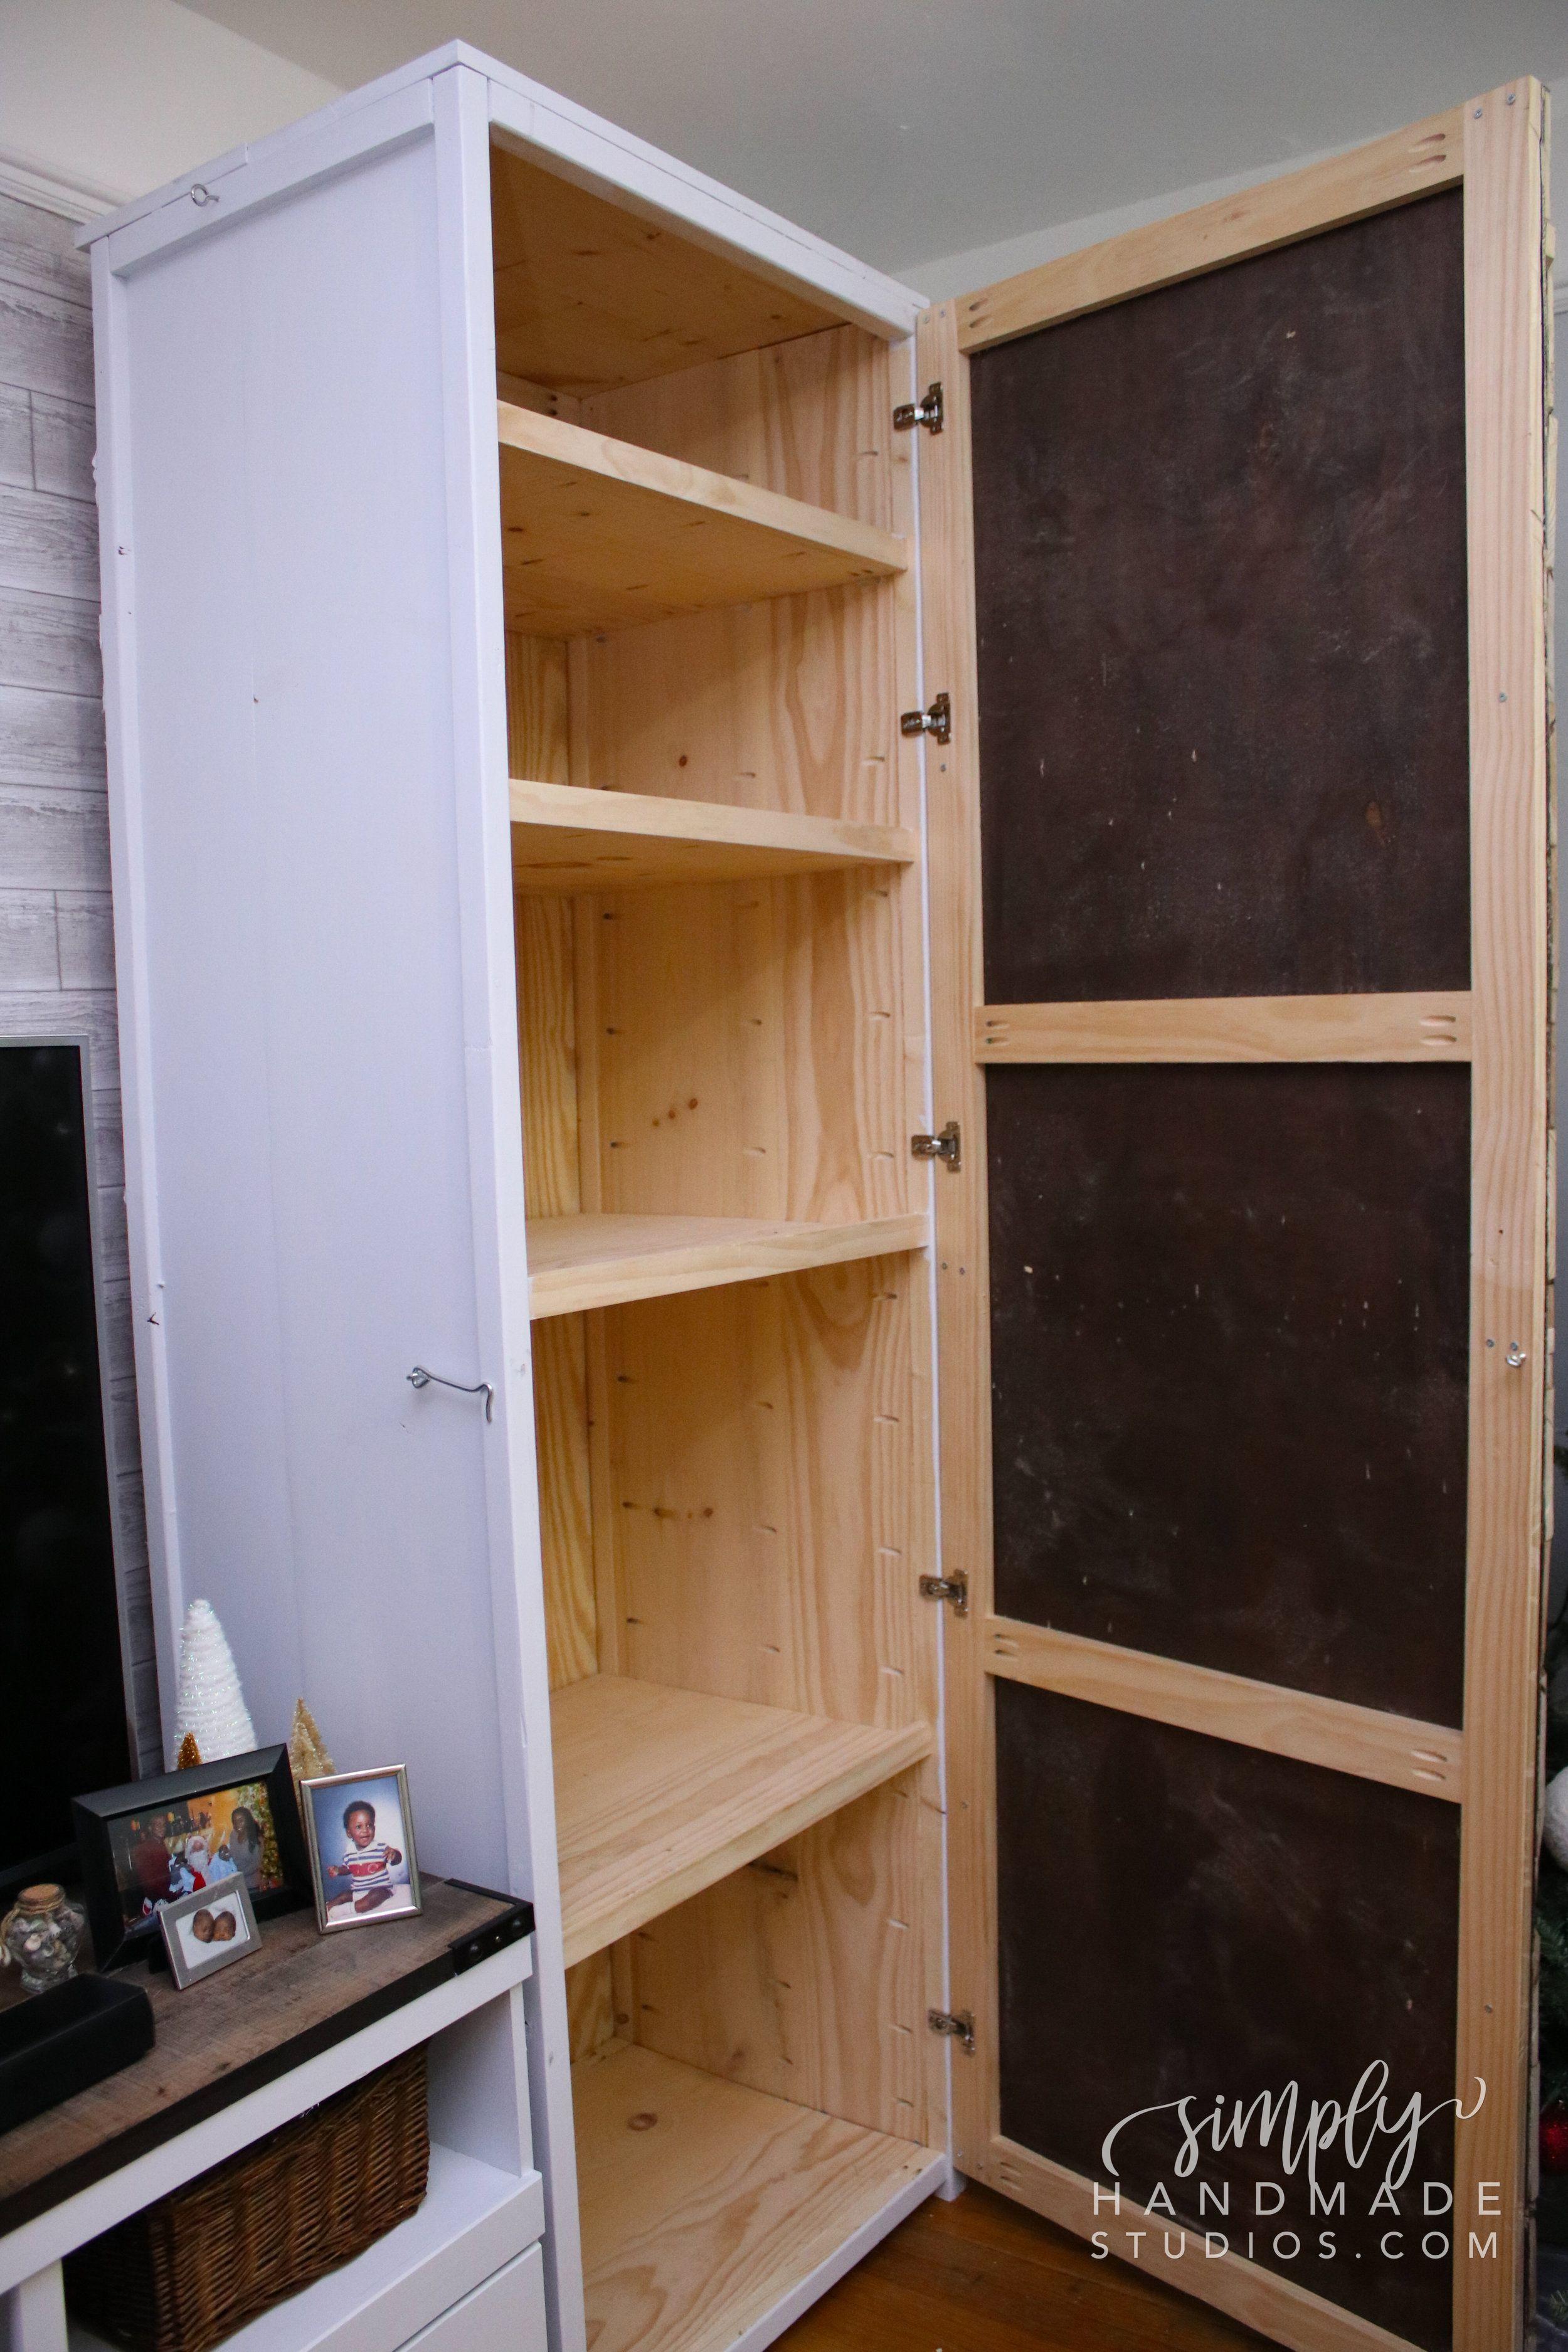 Pin On Workshop Garage Reclaimed Wood Industrial Ideas